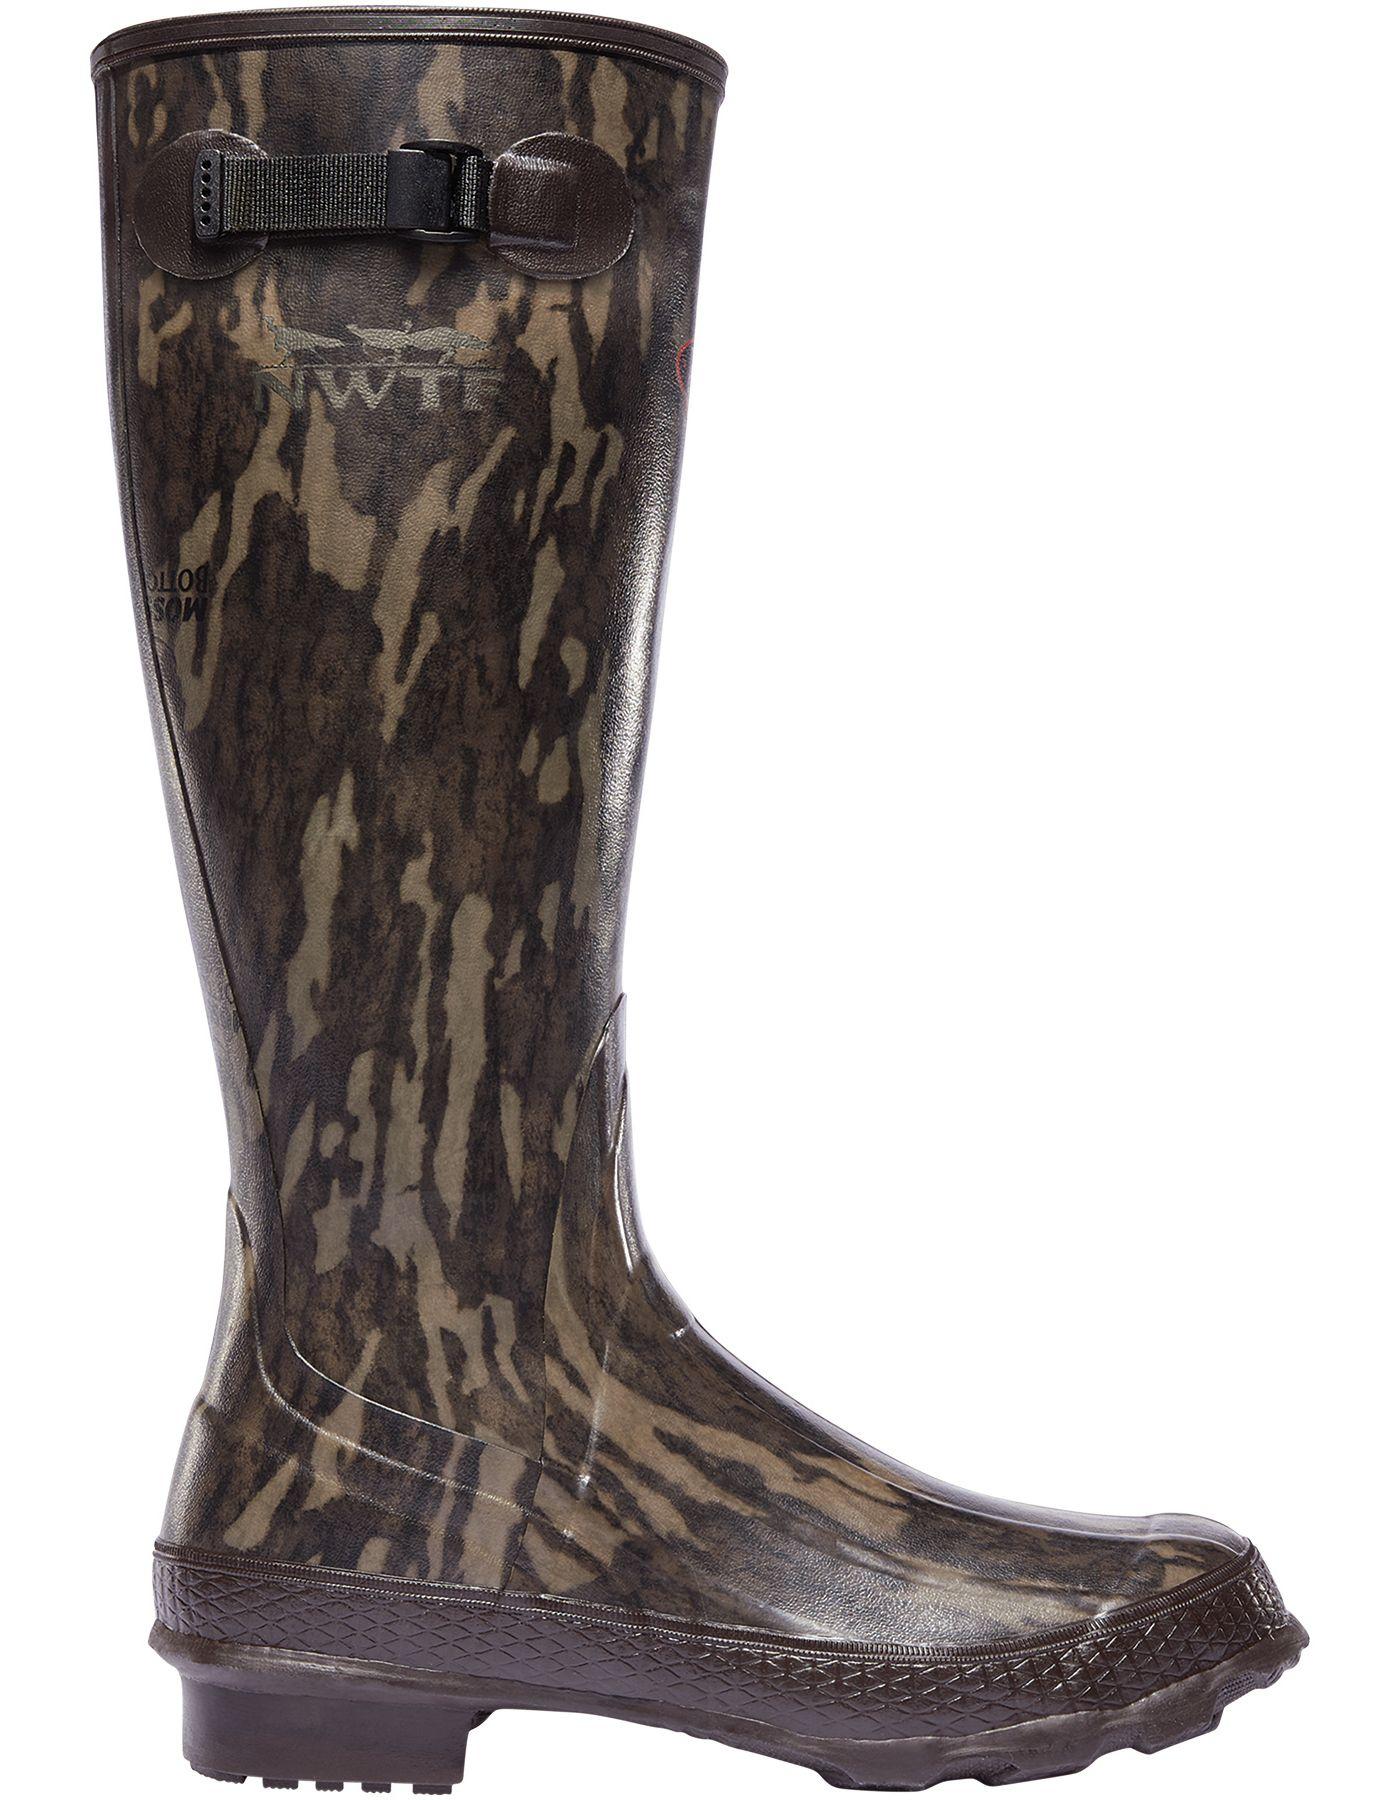 LaCrosse Men's NWTF Grange Mossy Oak Bottomland Rubber Hunting Boots